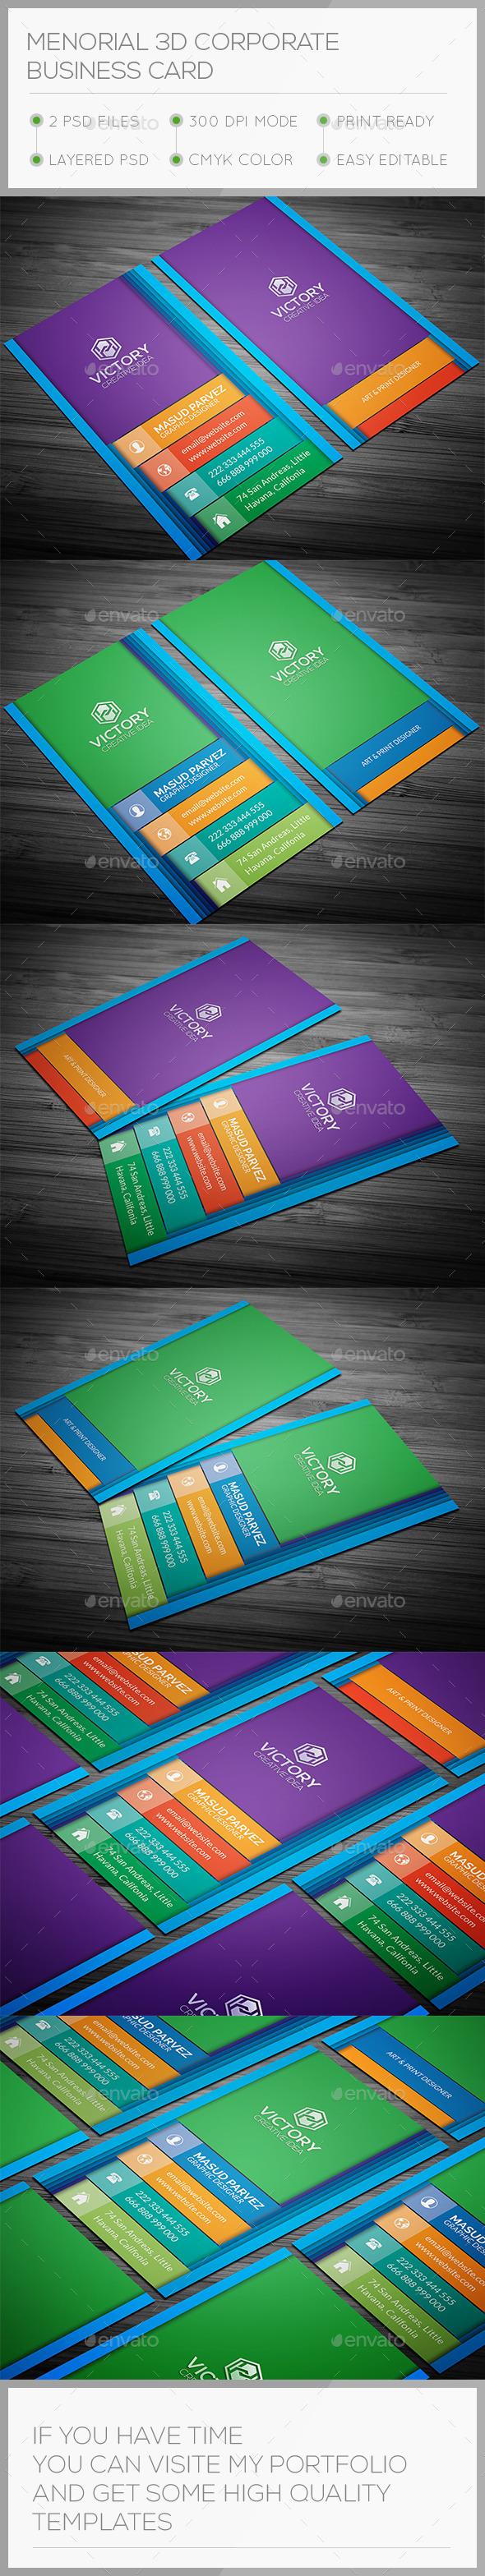 Menorial 3D Corporate Business Card - Creative Business Cards